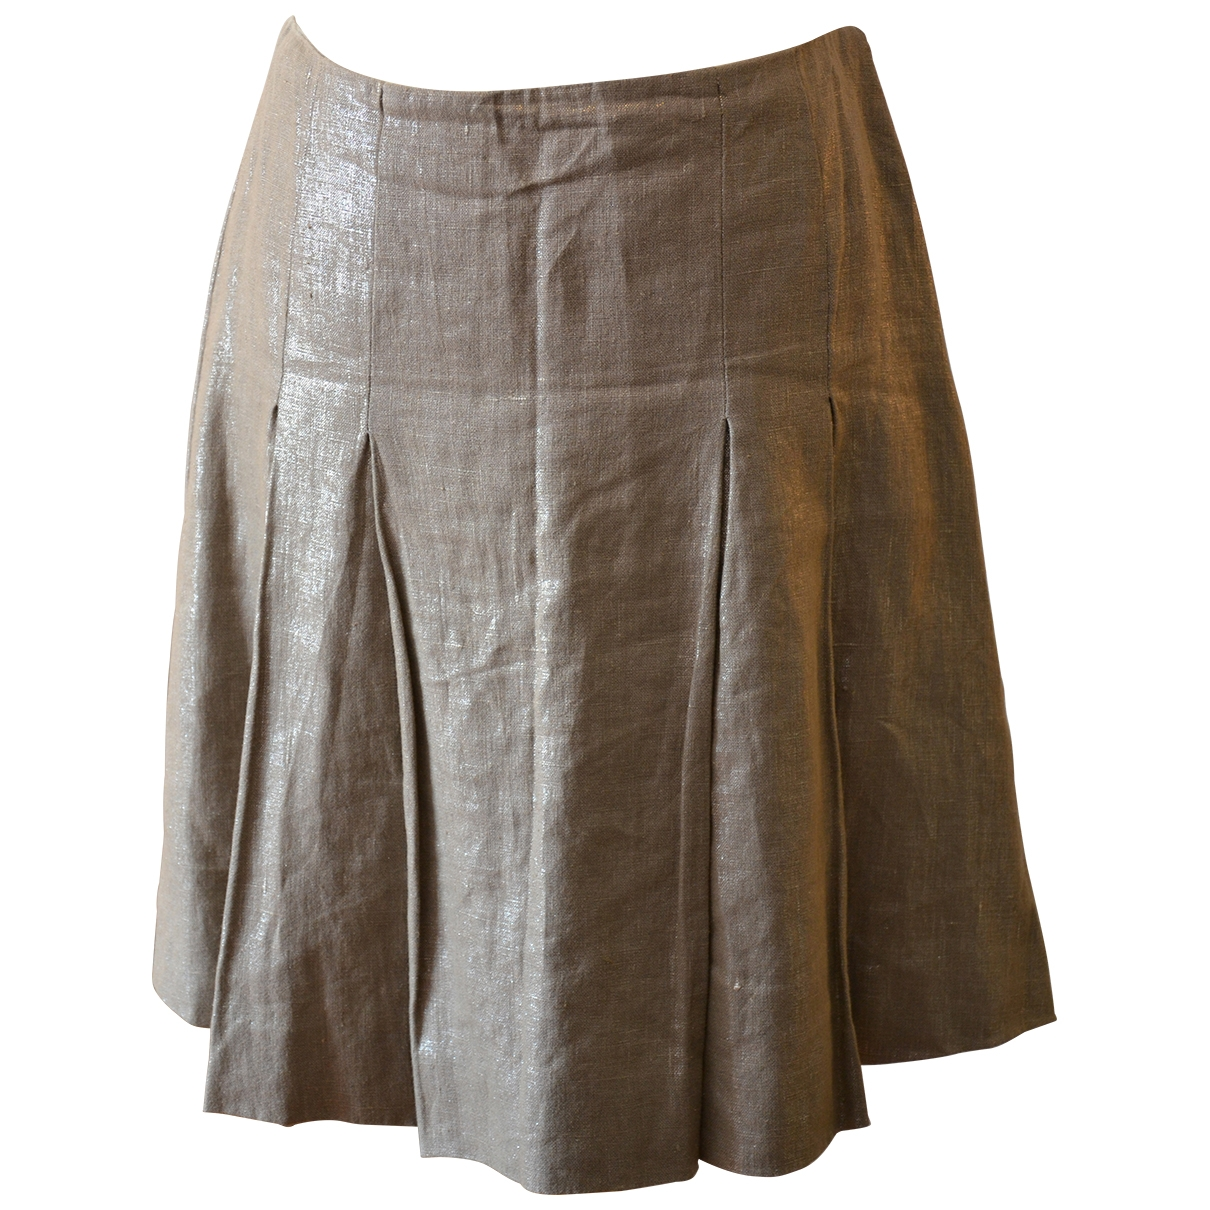 Etro \N Beige Linen skirt for Women 42 IT